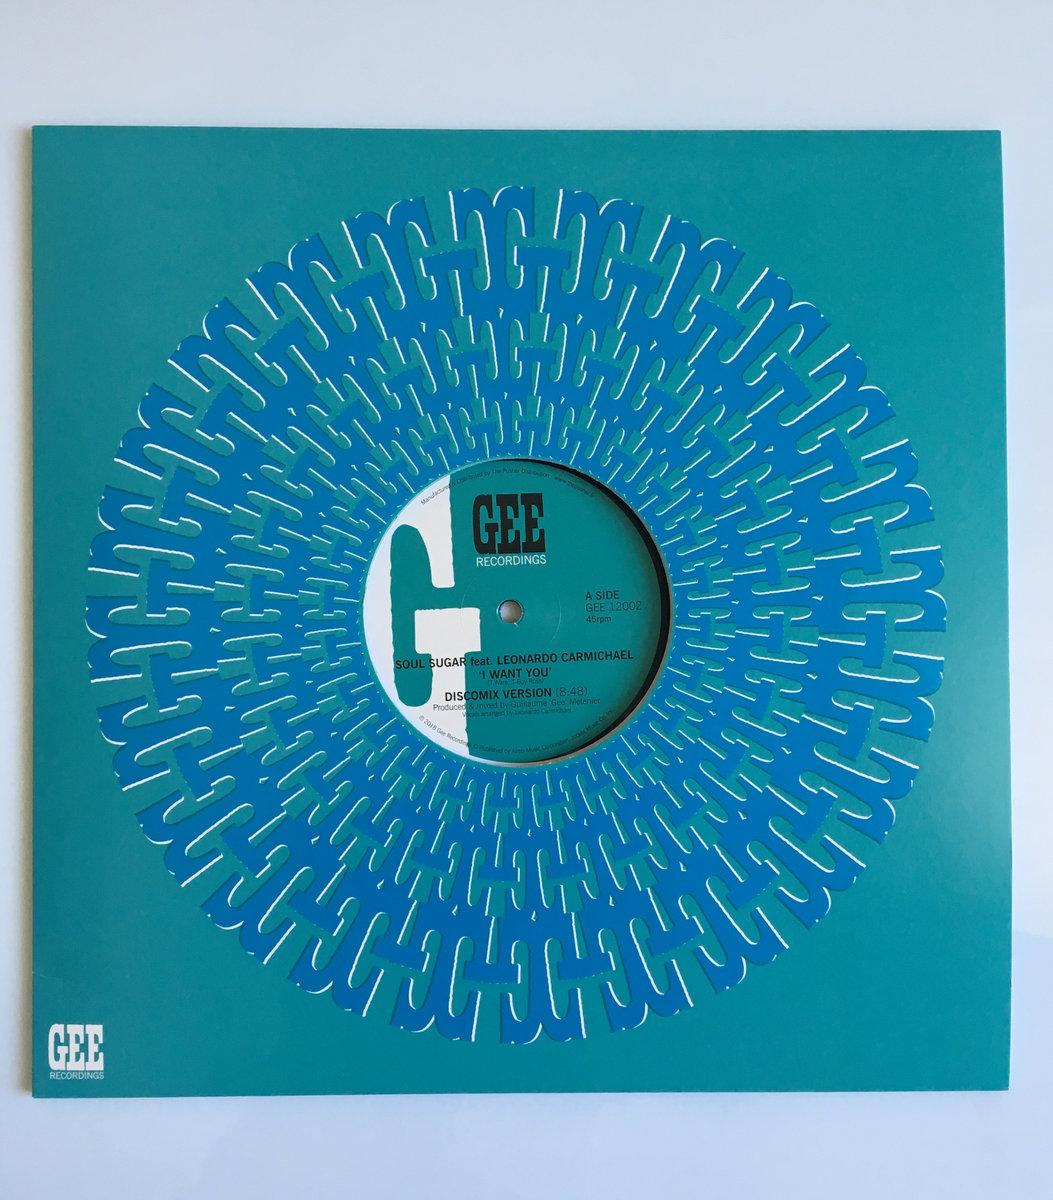 Sly & Robbie dub   Gee Recordings